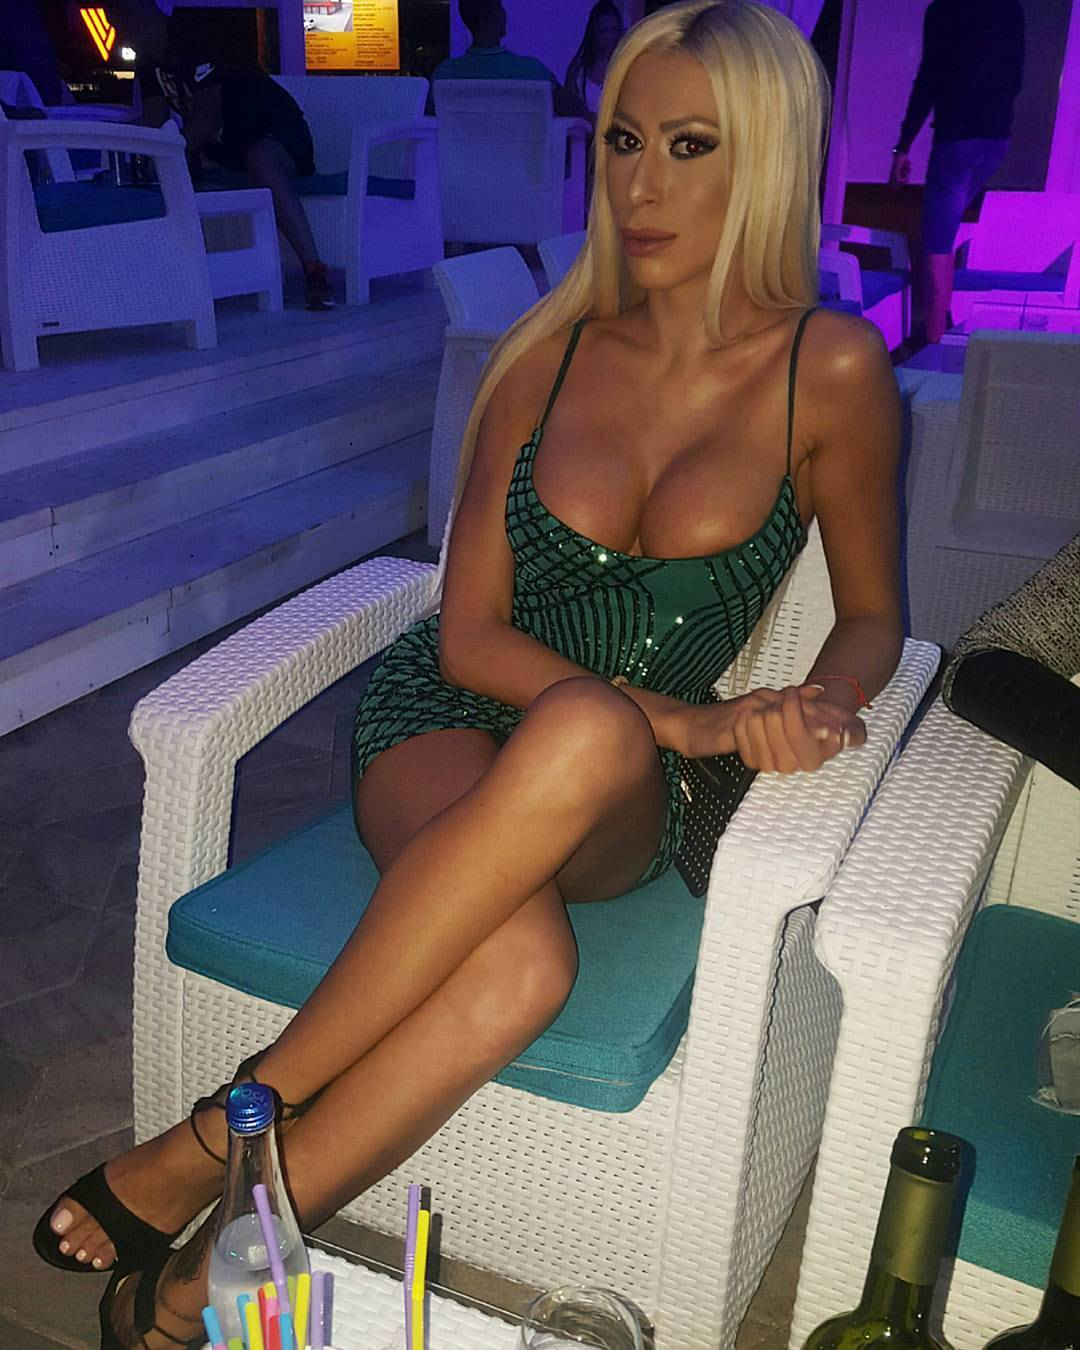 Milica Zivanovic Nude Photos 3